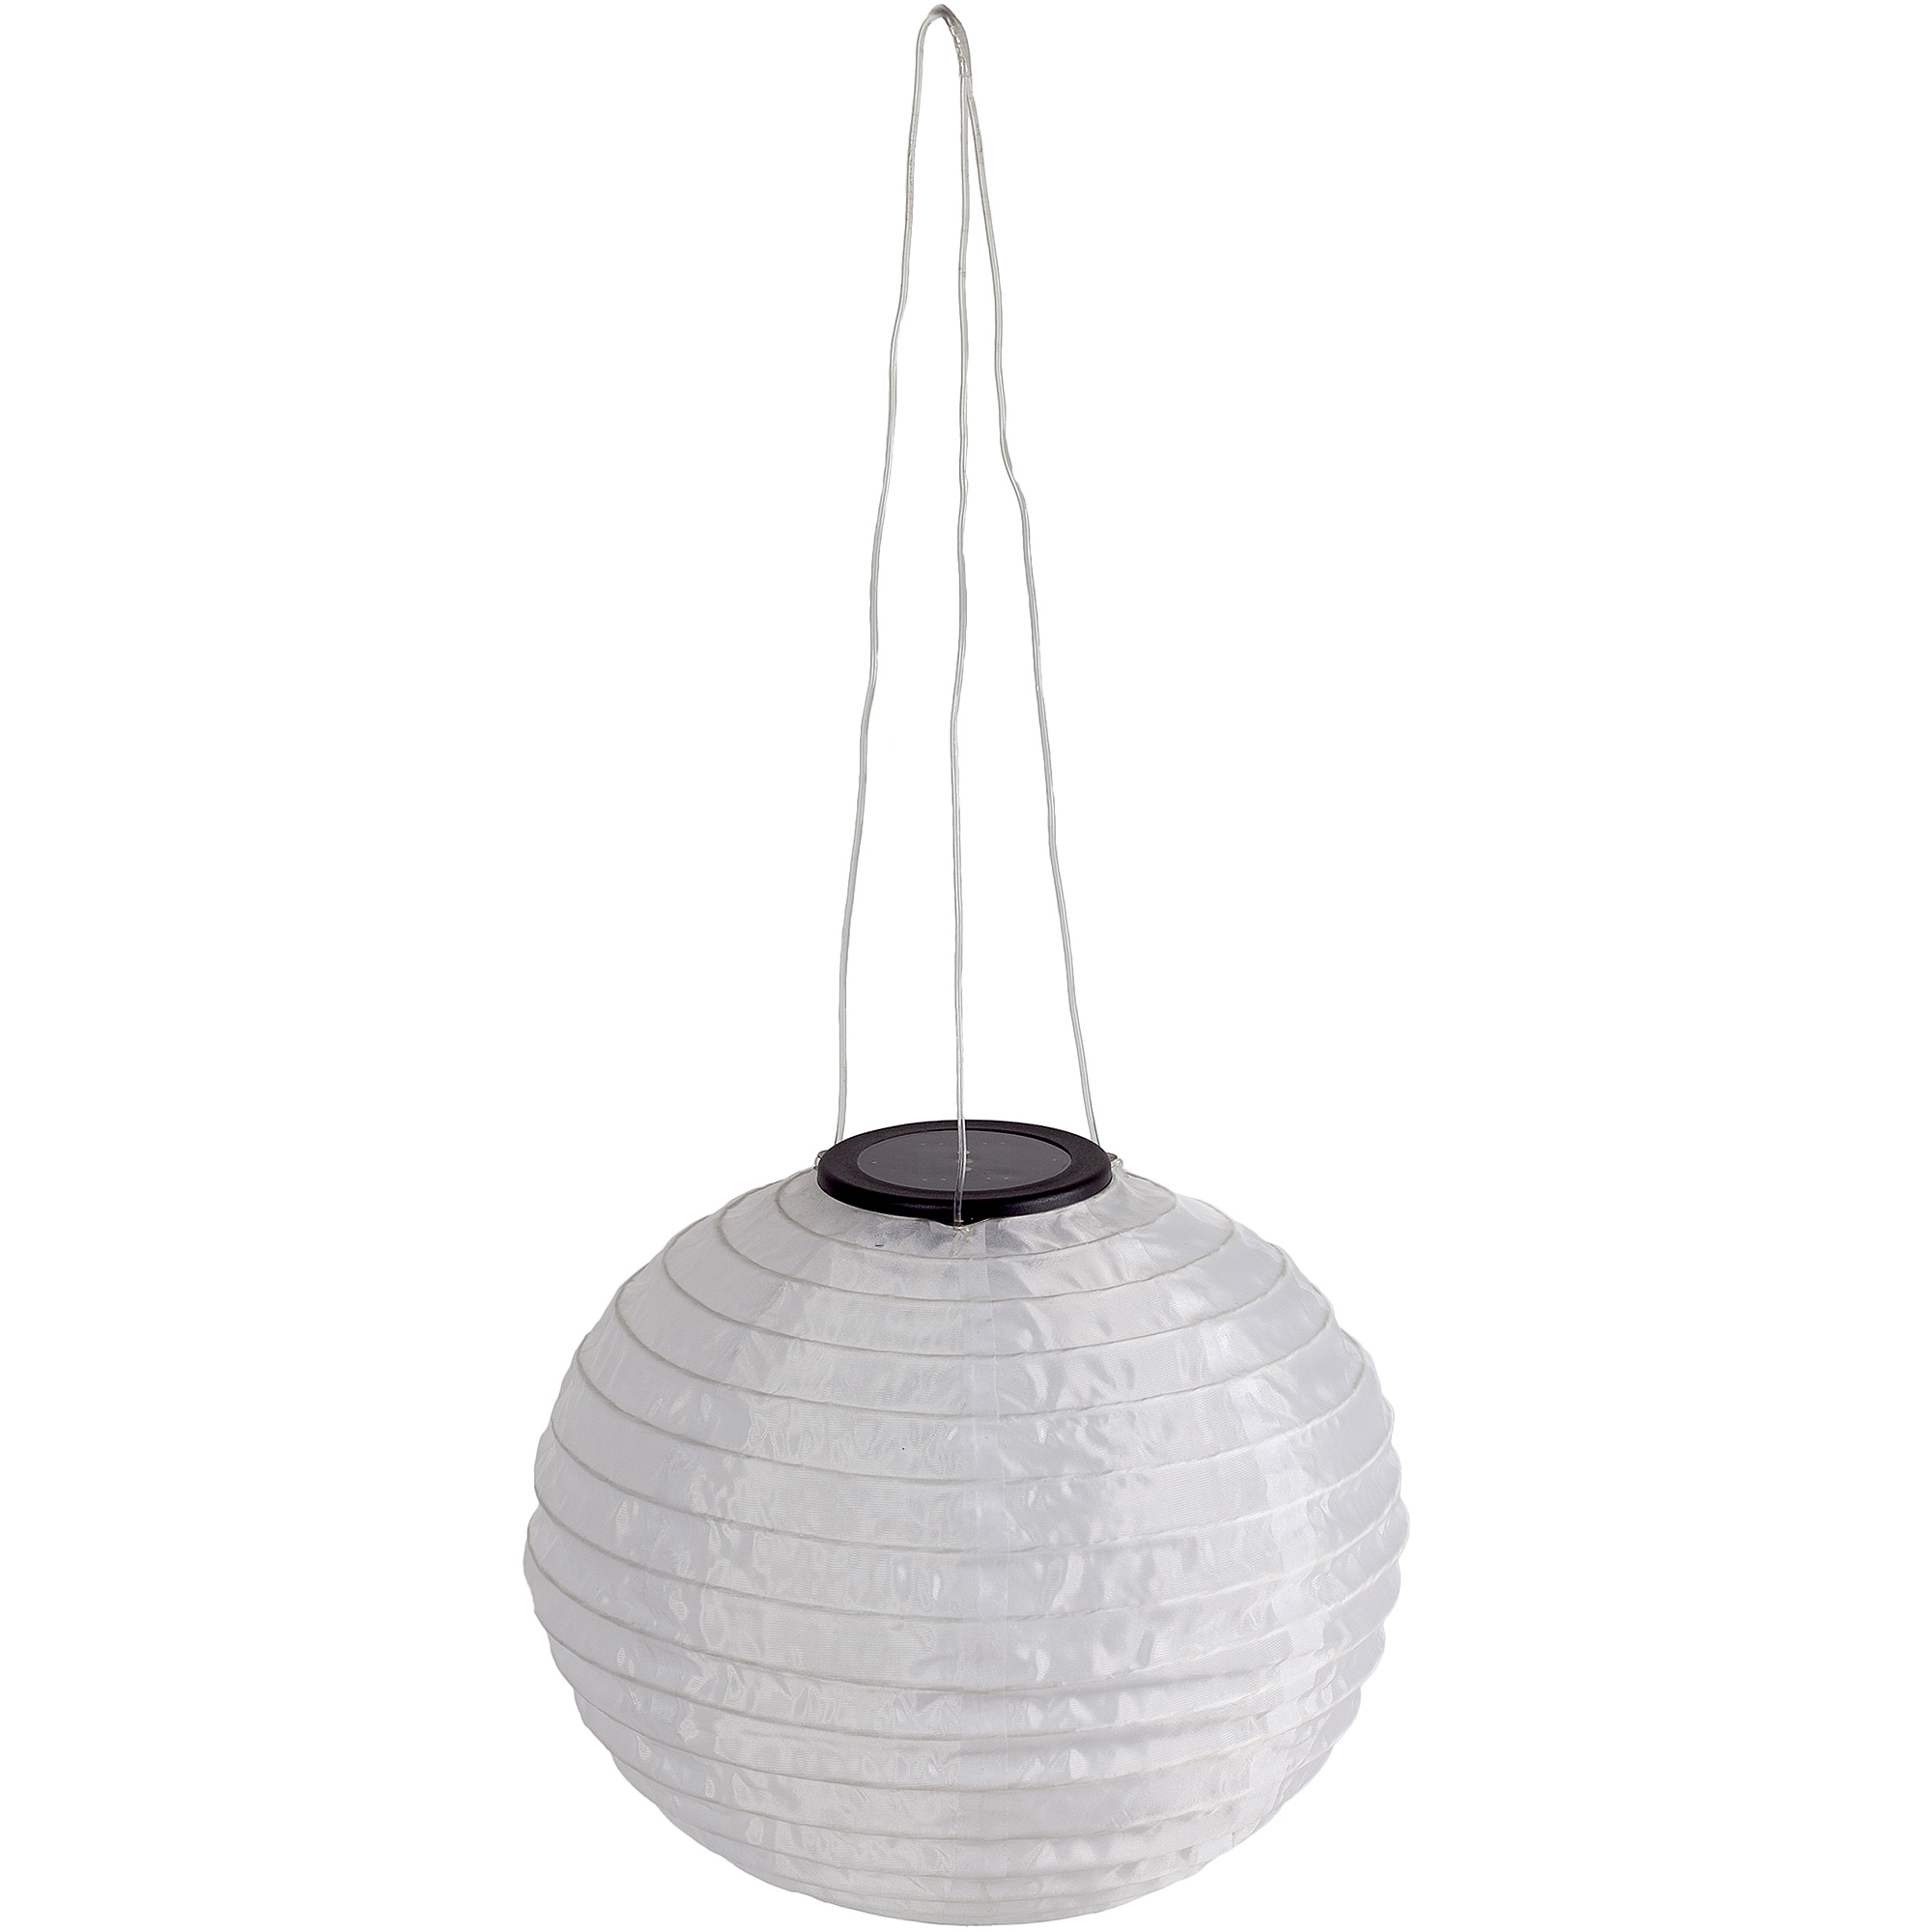 Solar White Fabric Hanging Lantern, 2x Brighter by Shenzhen Jiawei Photovoltaic Lighting Co., LTD.